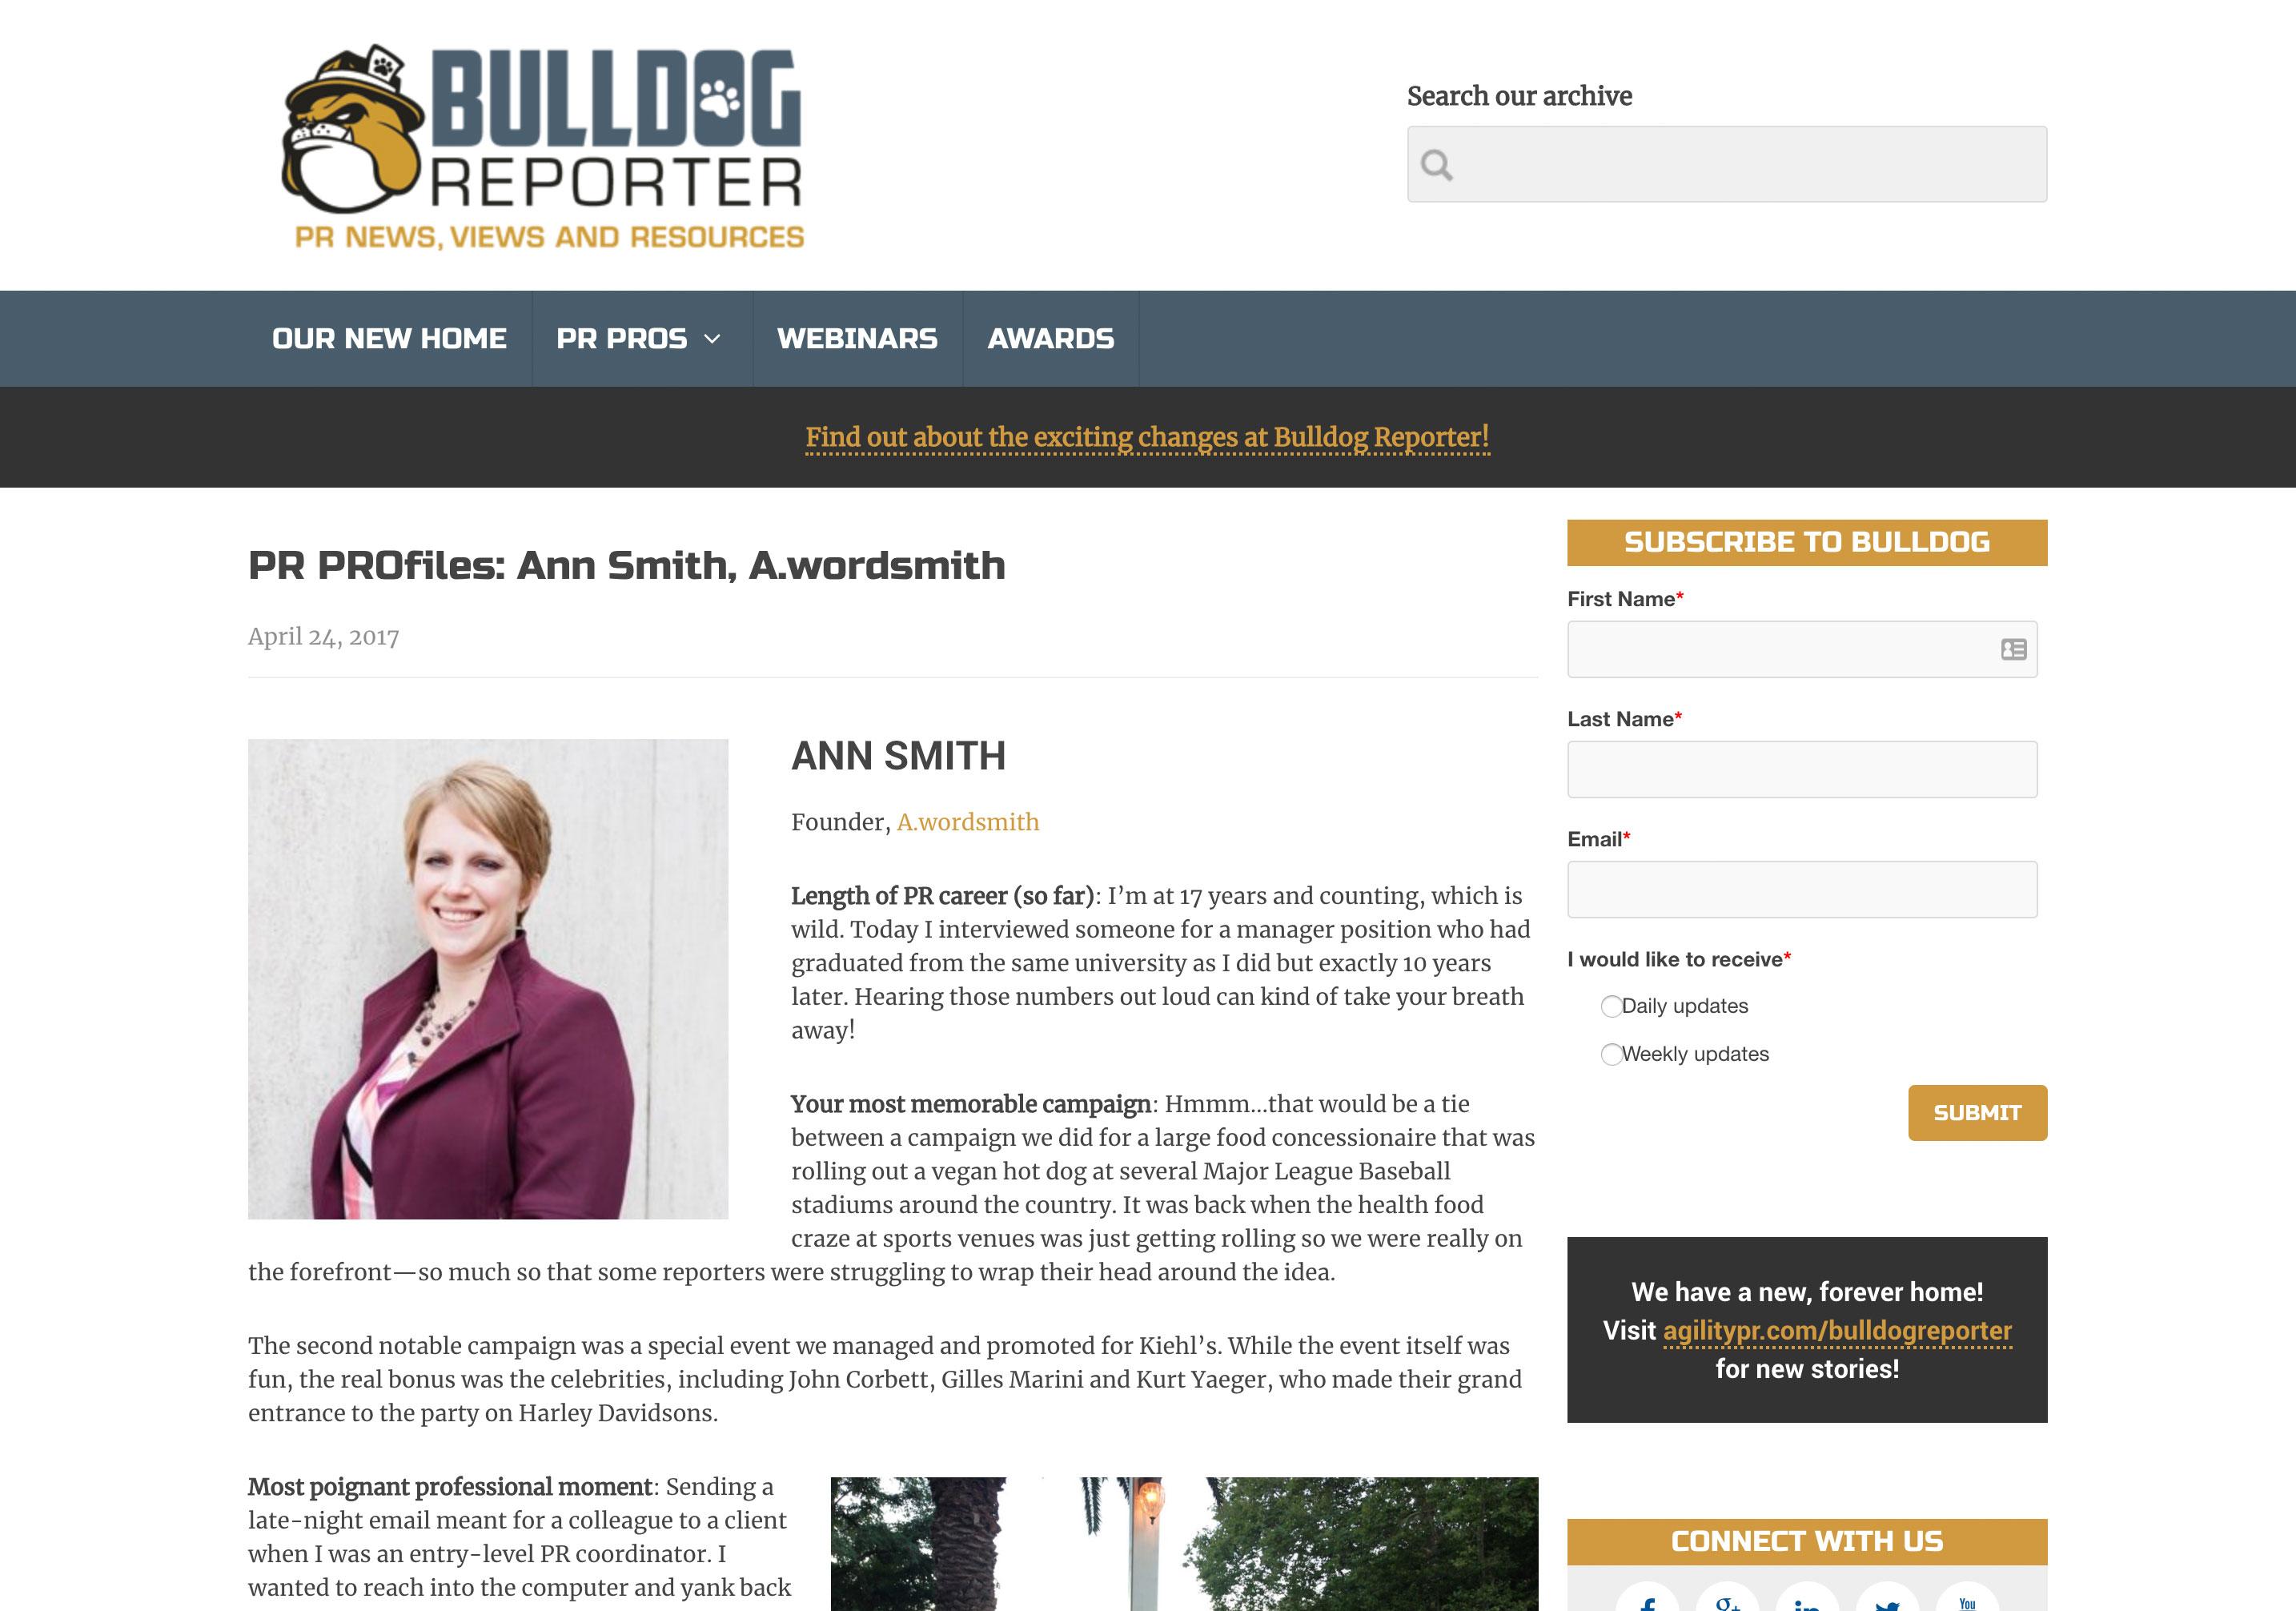 bulldog_reporter